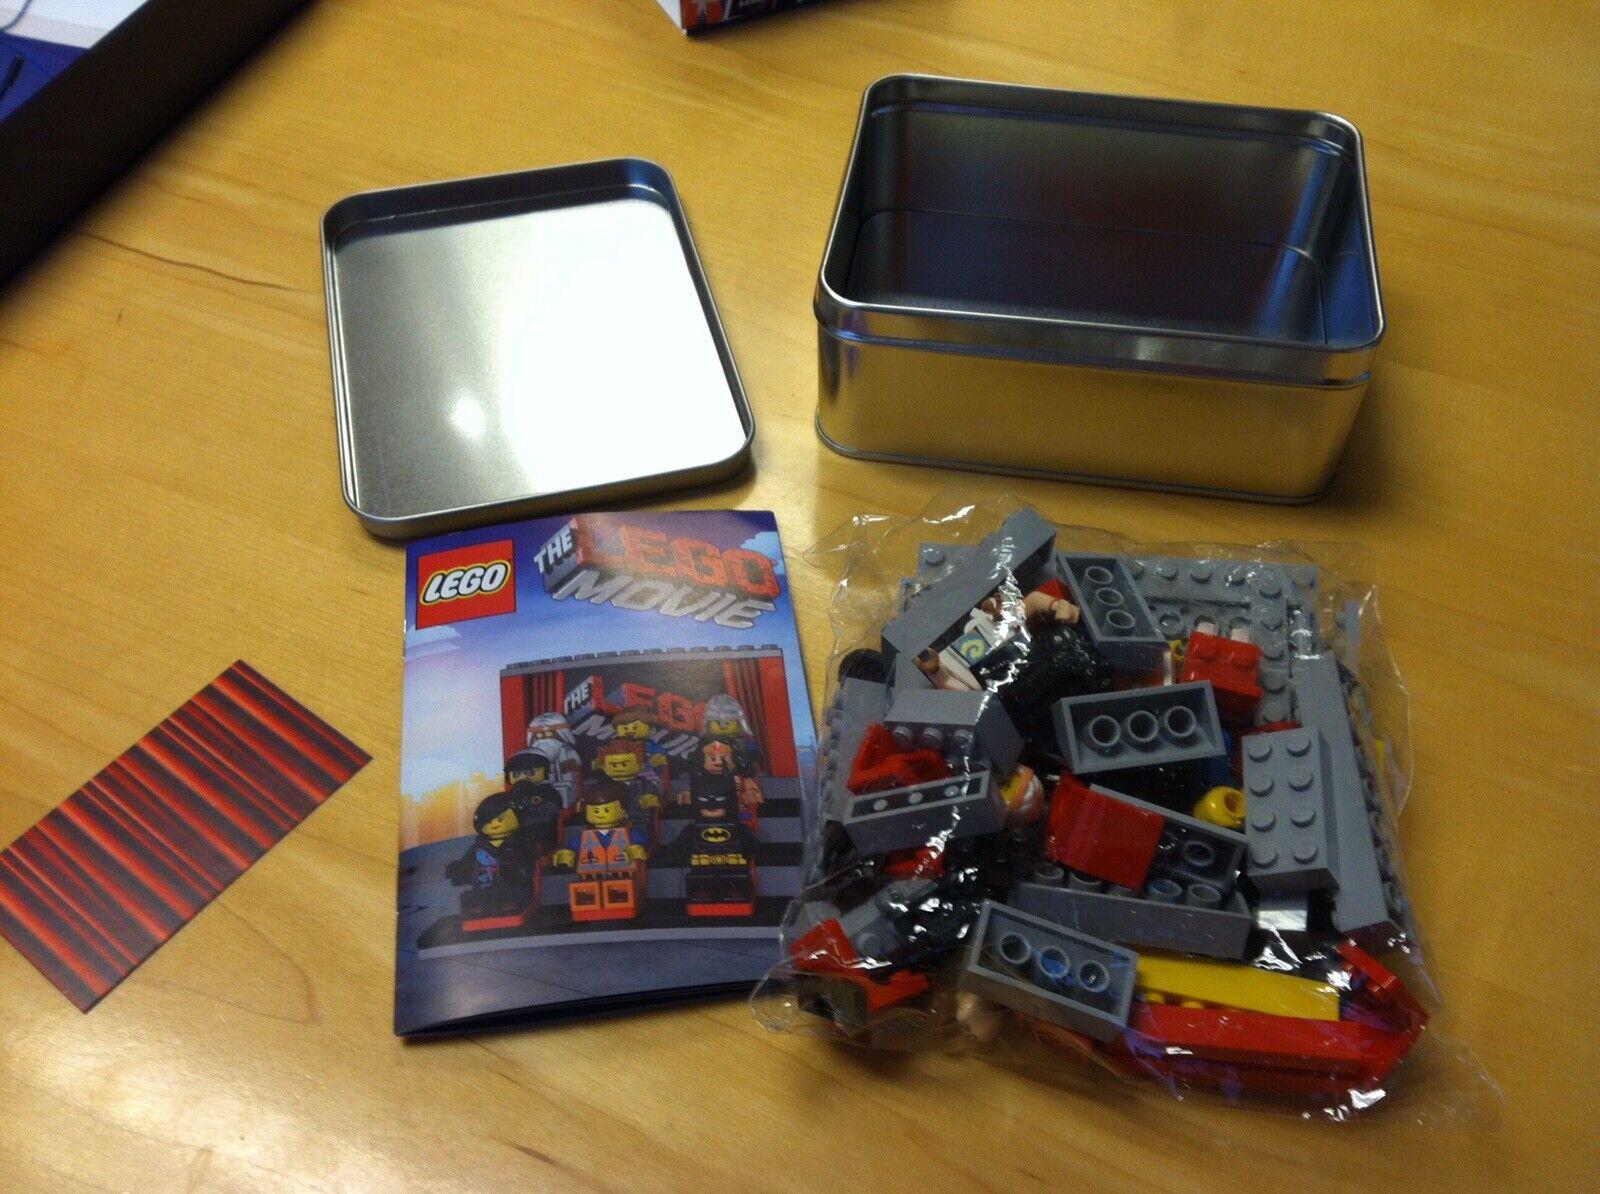 Lego movie limited promo promo promo tin 2014 b76be1